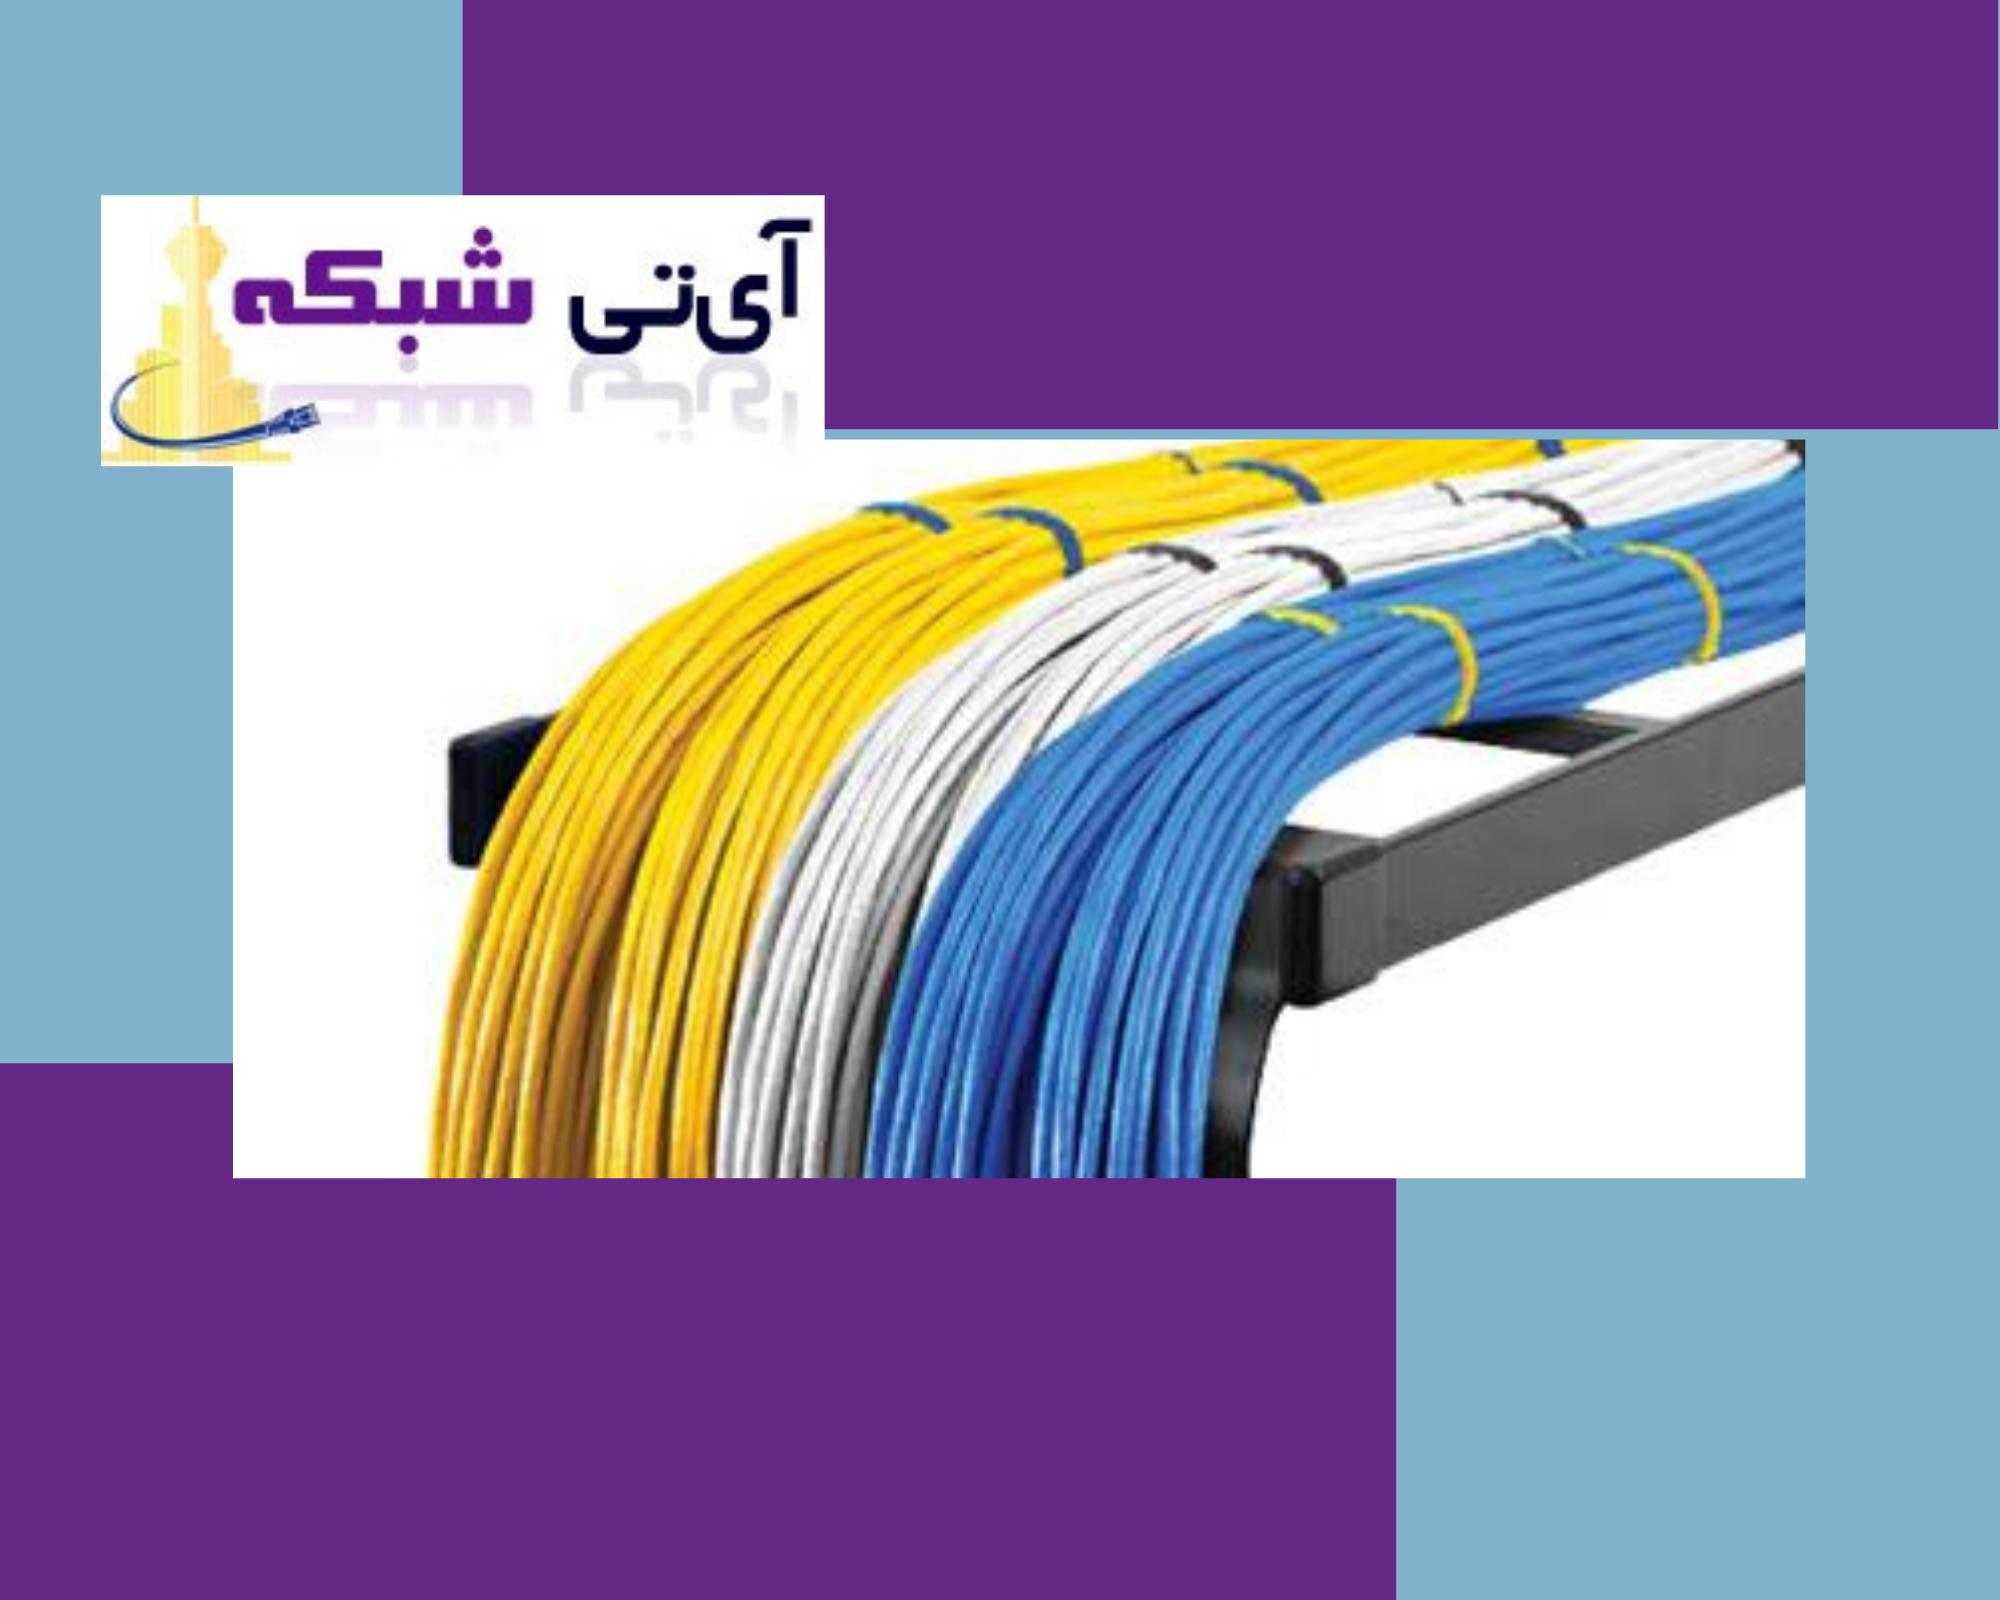 کابل - شبکه - ای - تی شبکه